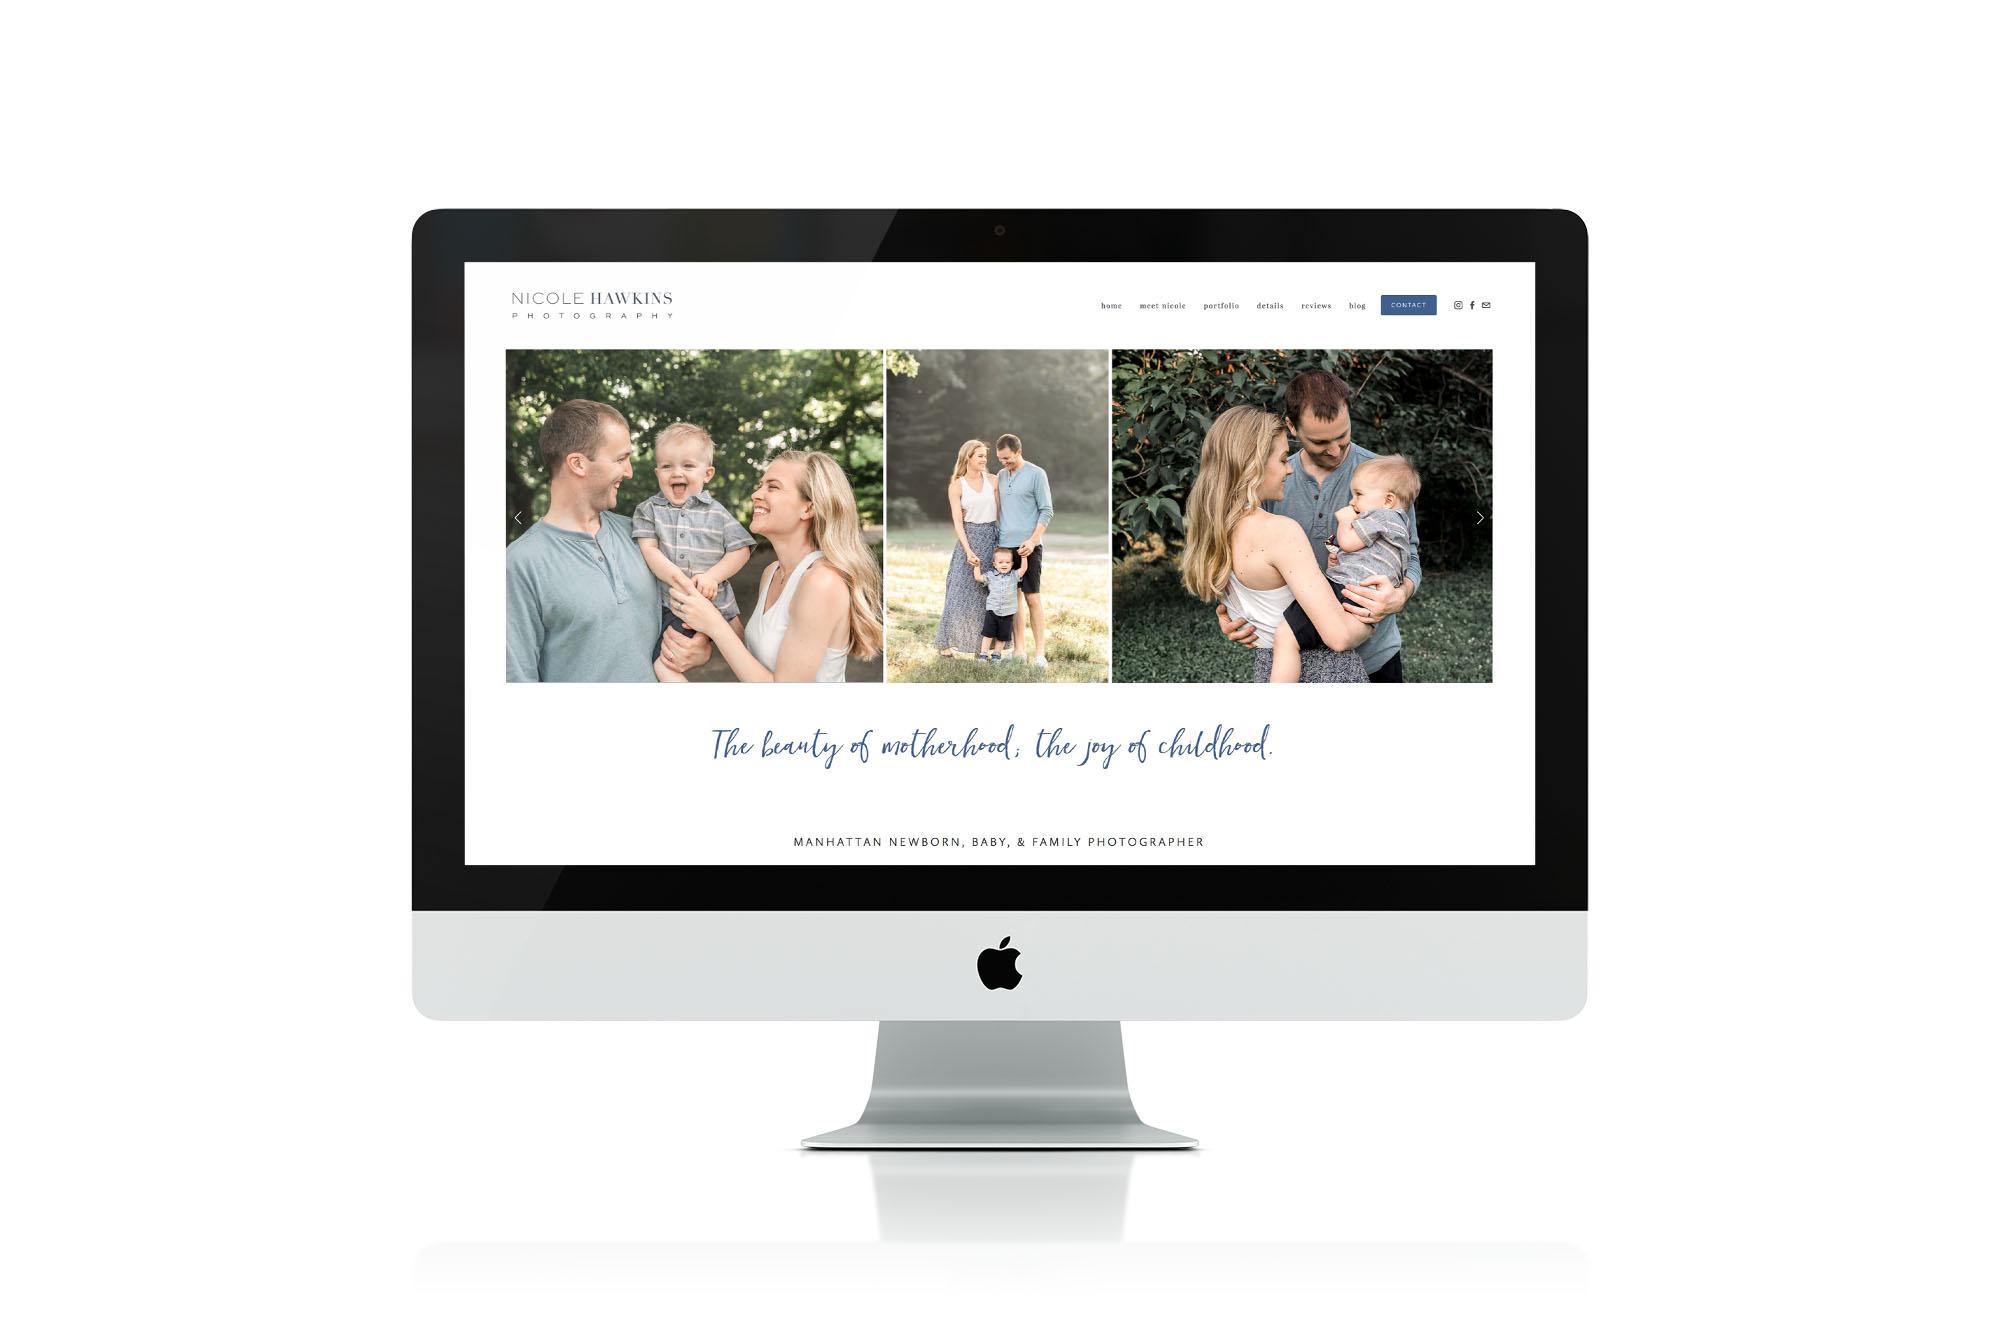 Nicole-Hawkins-Photography-custom-luxury-squarespace-for-photographers-inspiration-.jpg